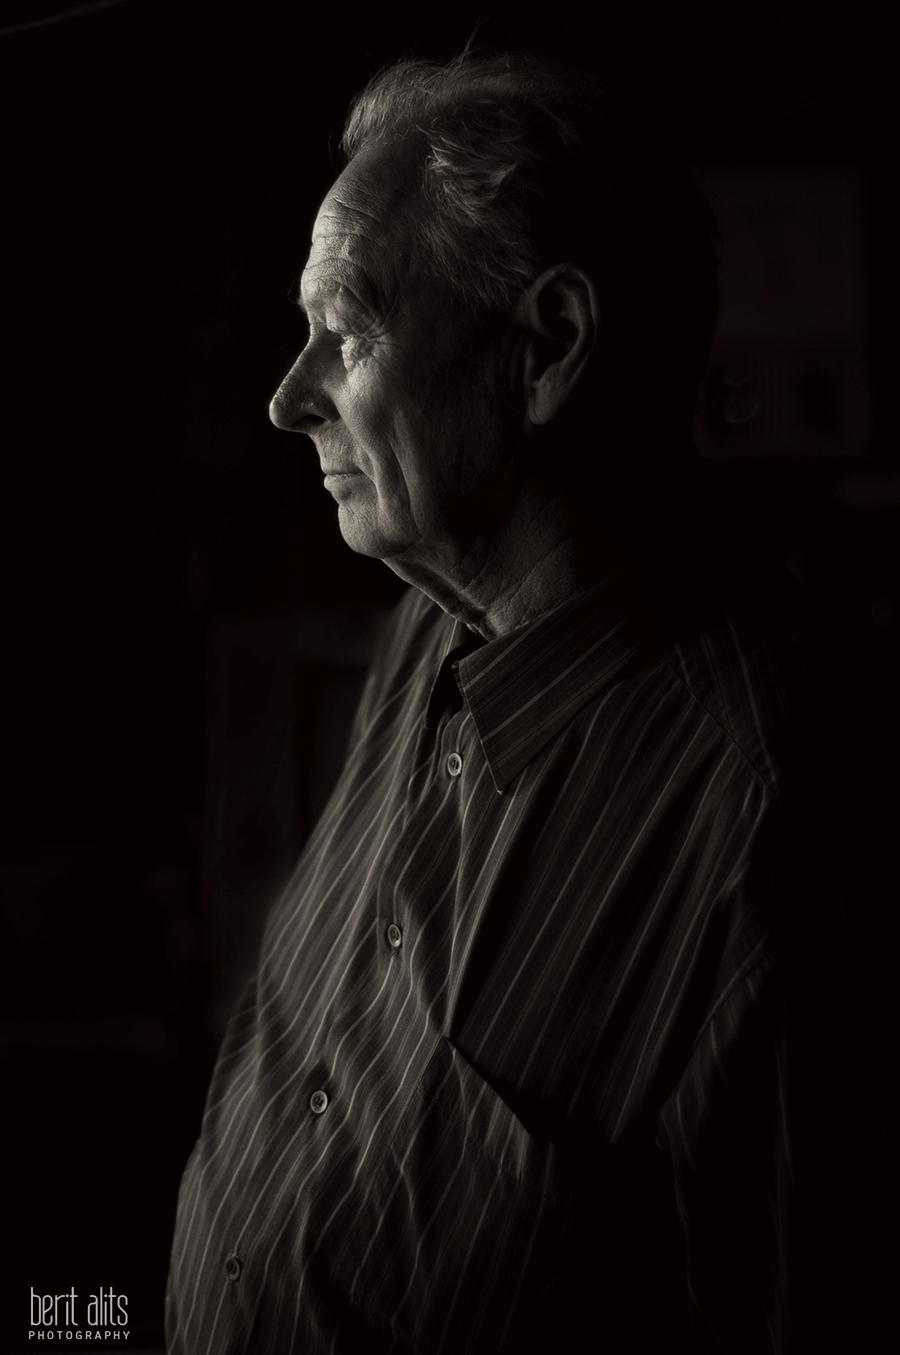 DSC_0293_creative_portrait_photography_photographer_grandfather_black_and_white_window_light